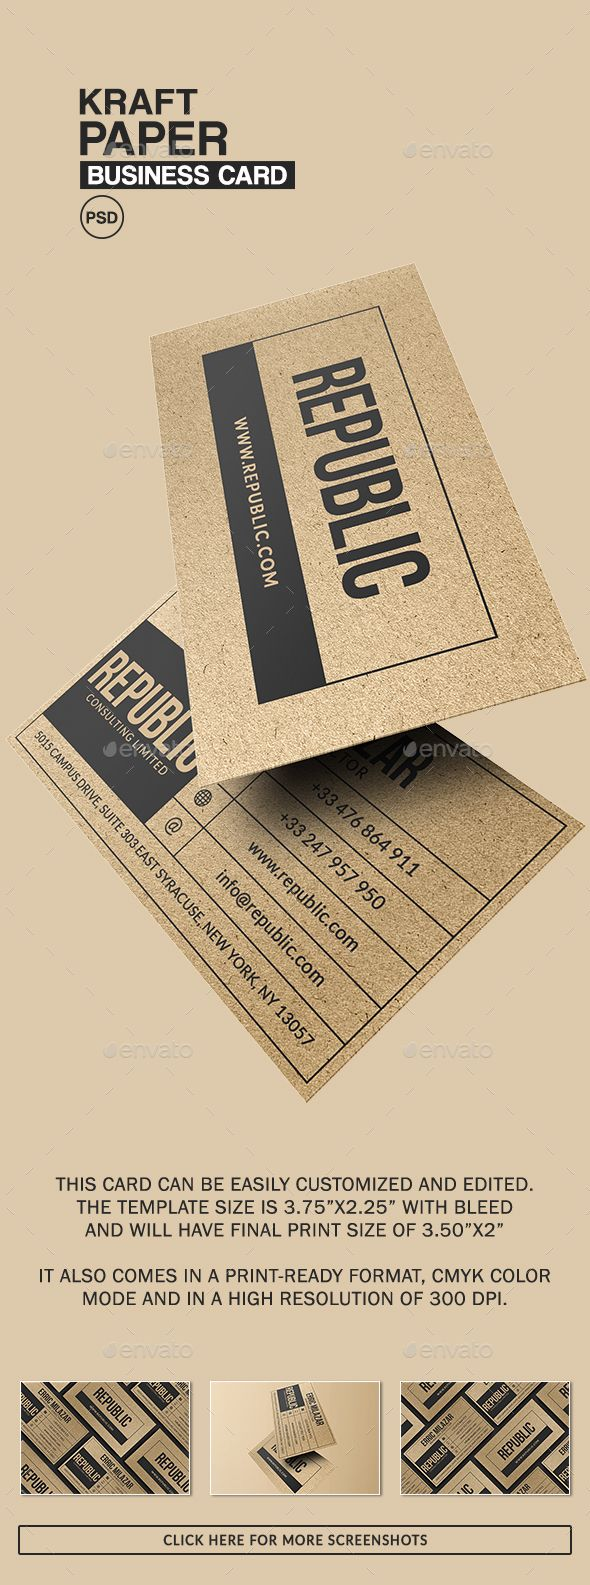 Best 20 Business card size ideas on Pinterest